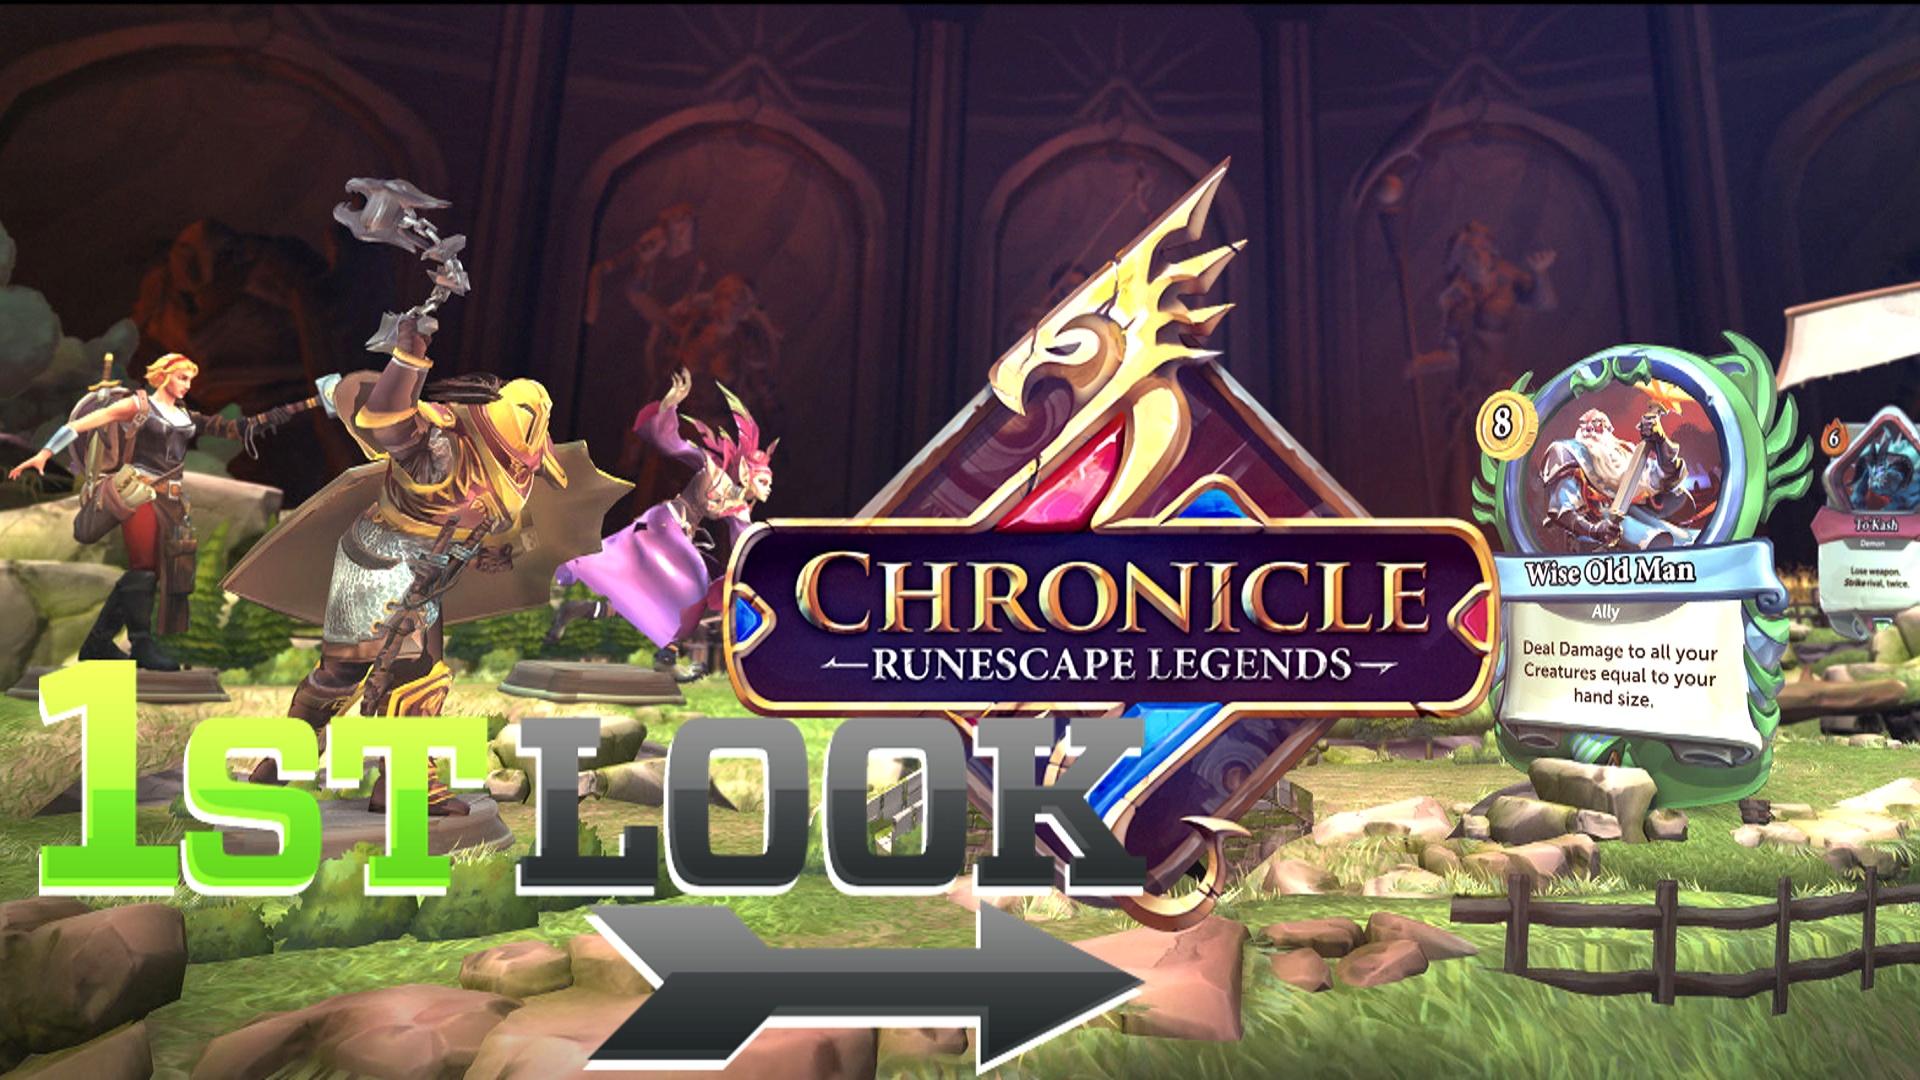 Chronicle: RuneScape Legends - First Look